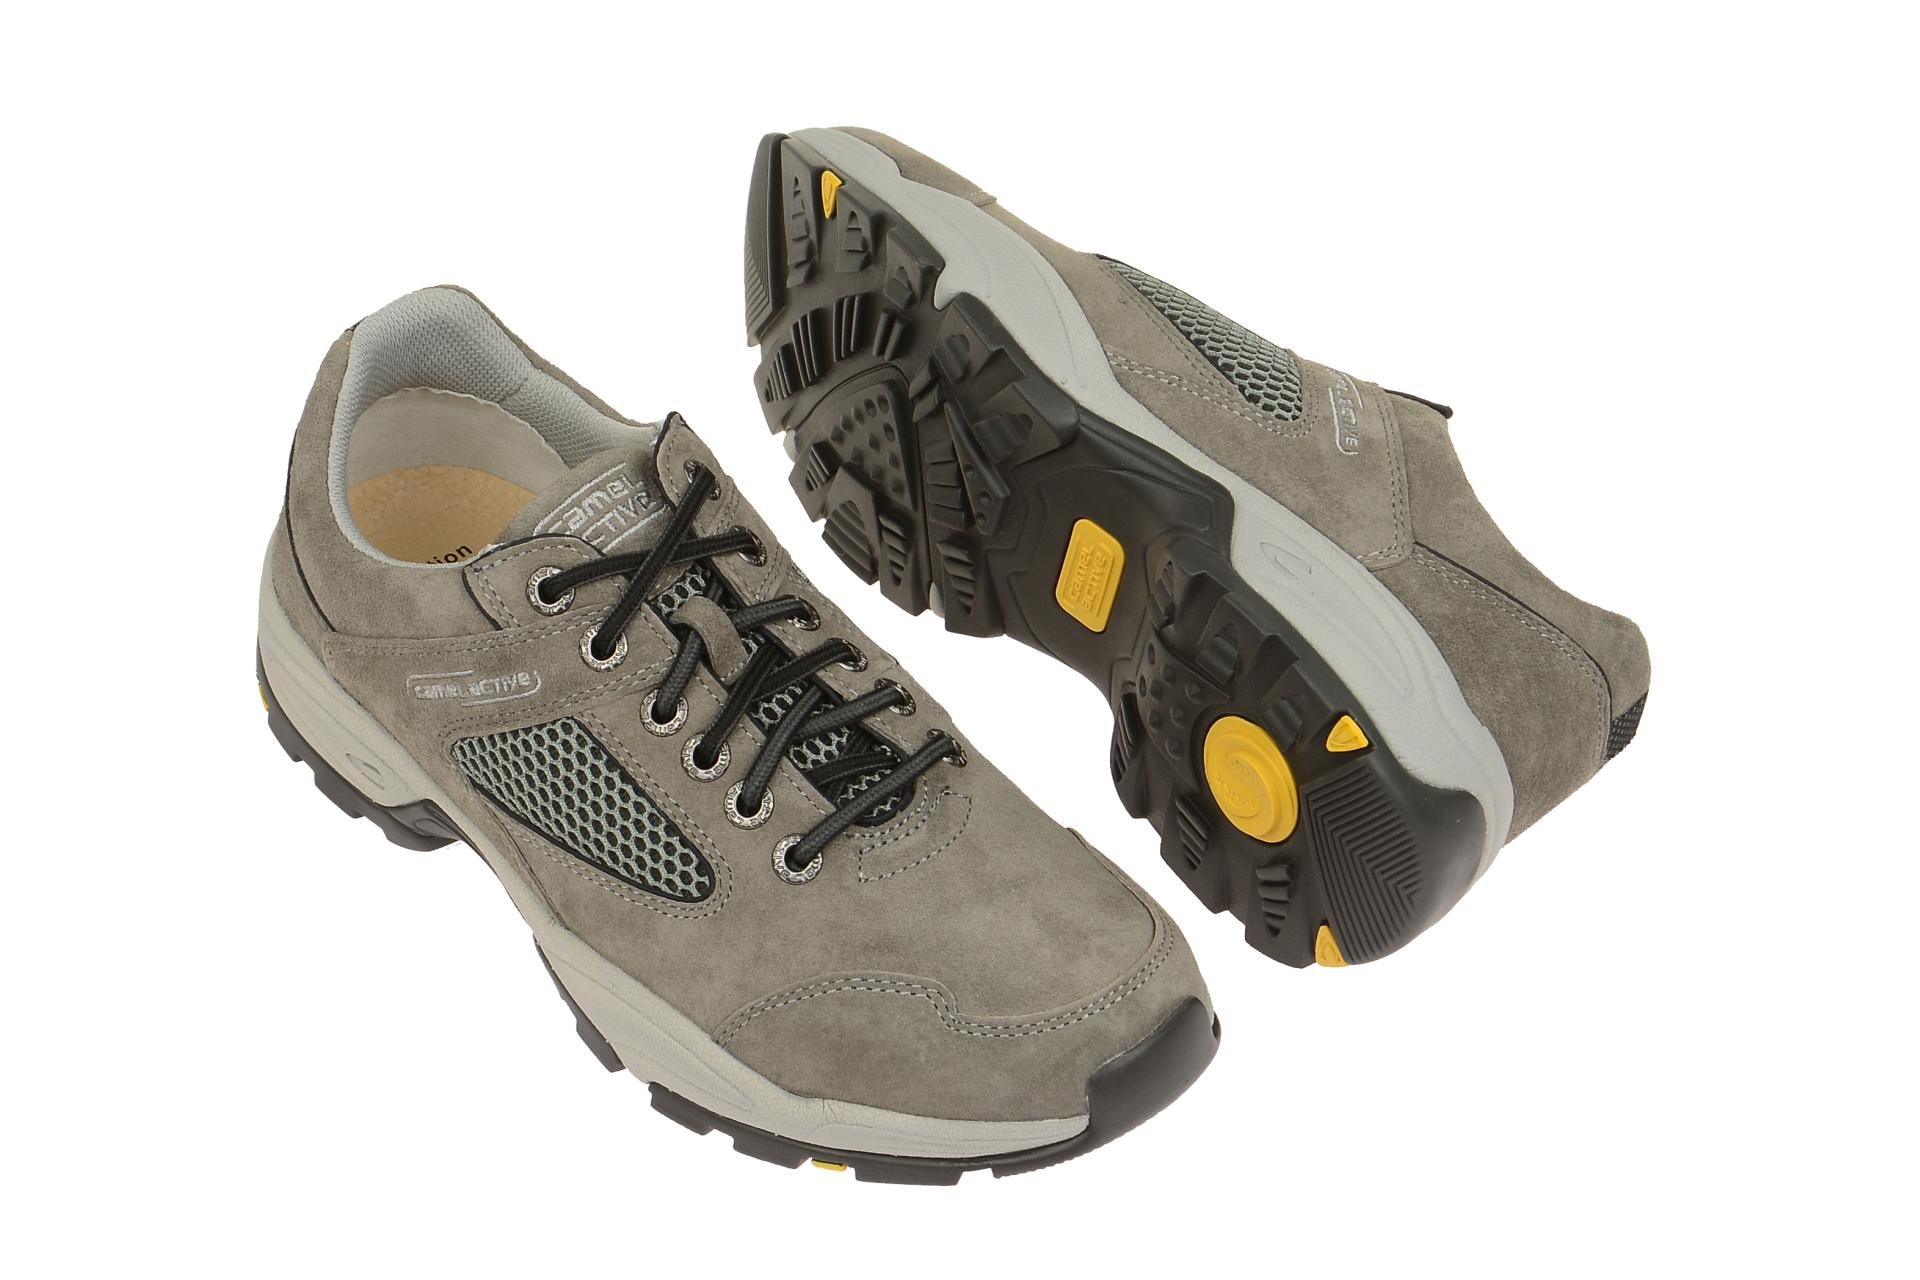 8c9b7f95b3e2 Details zu camel active Schuhe EVOLUTION grau Herrenschuhe sportliche  Halbschuhe 138.11.25